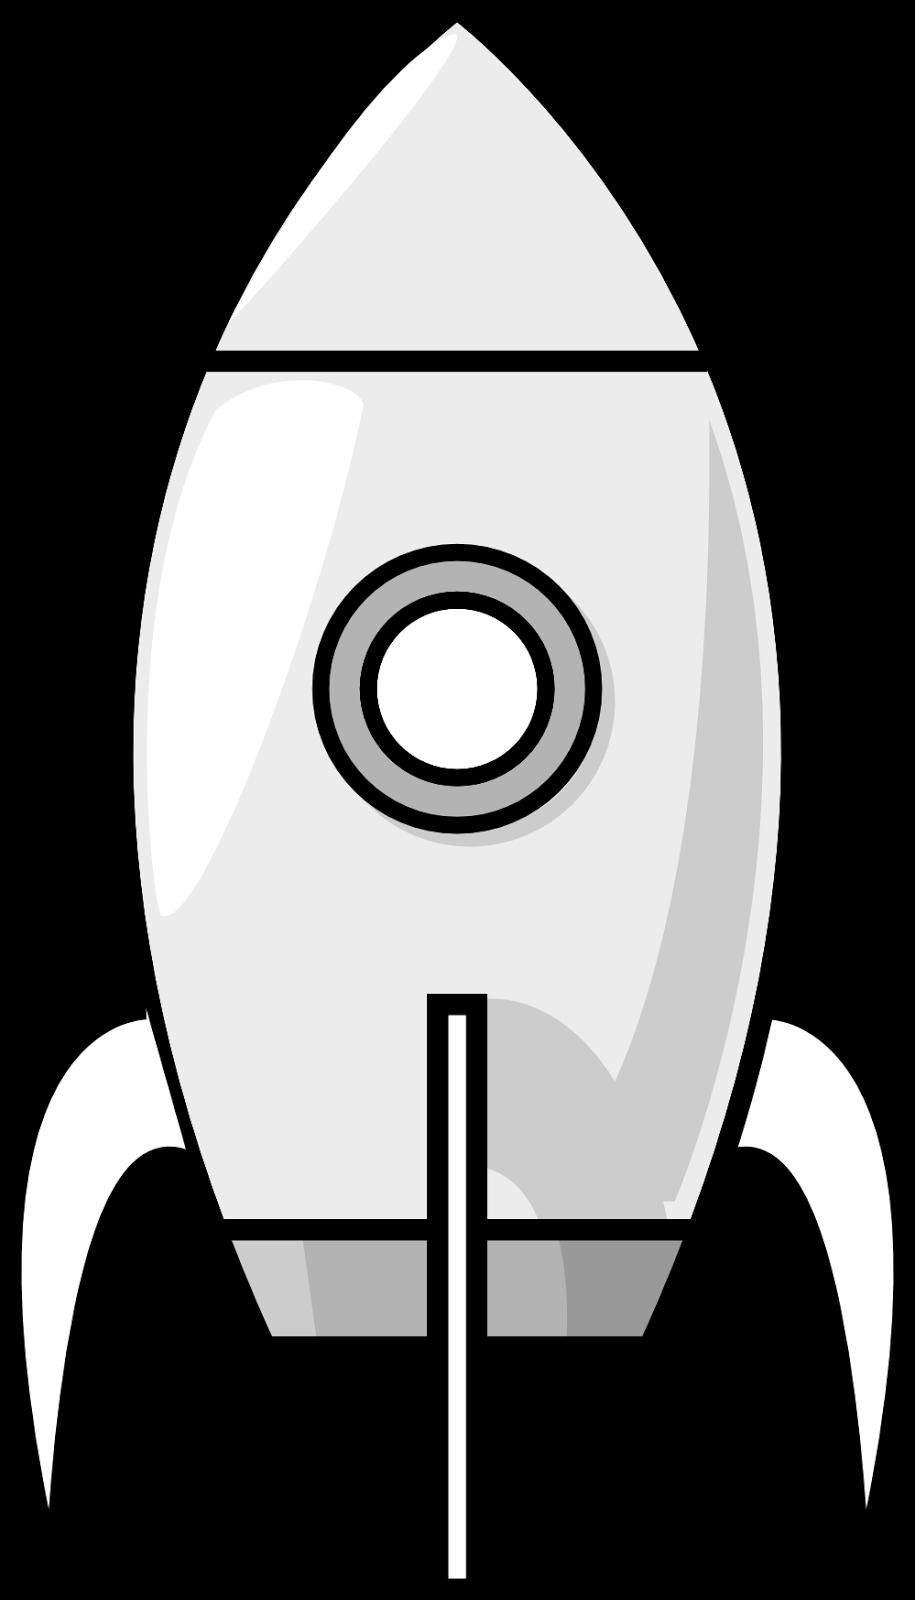 Clipart rocket rocket ship. Download png free icons